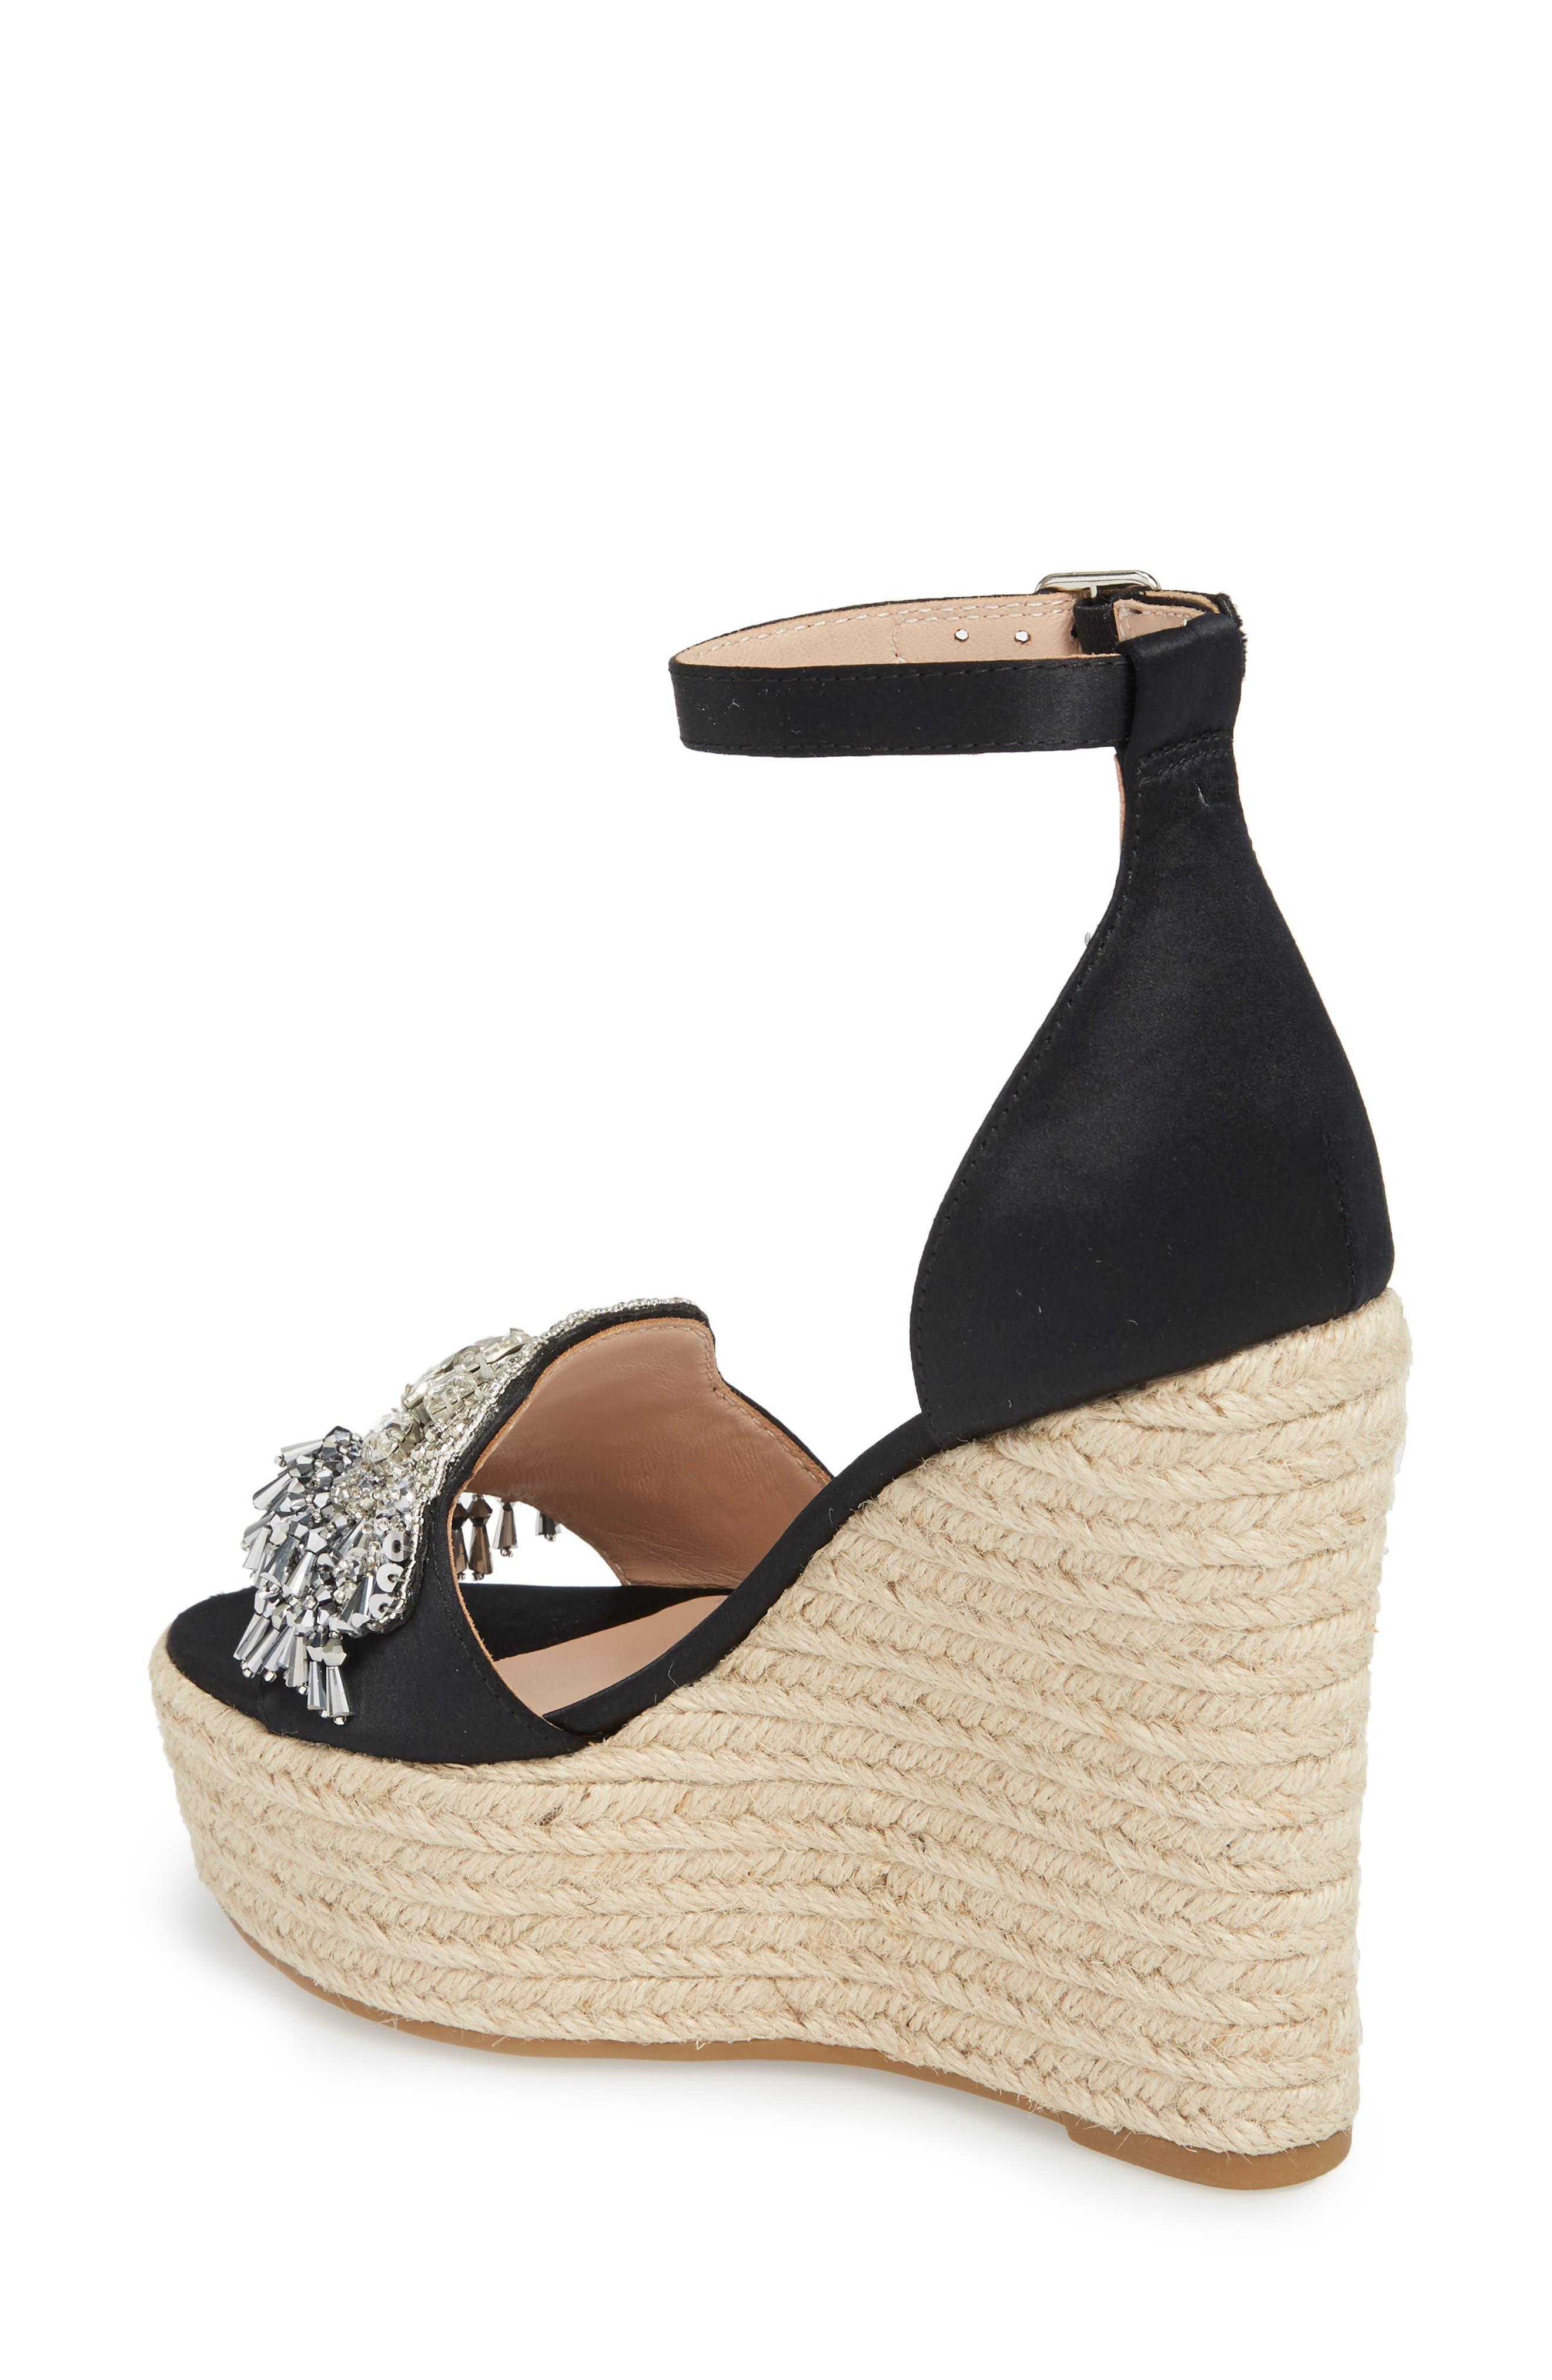 Maxim Platform Wedge Sandal,                             Alternate thumbnail 4, color,